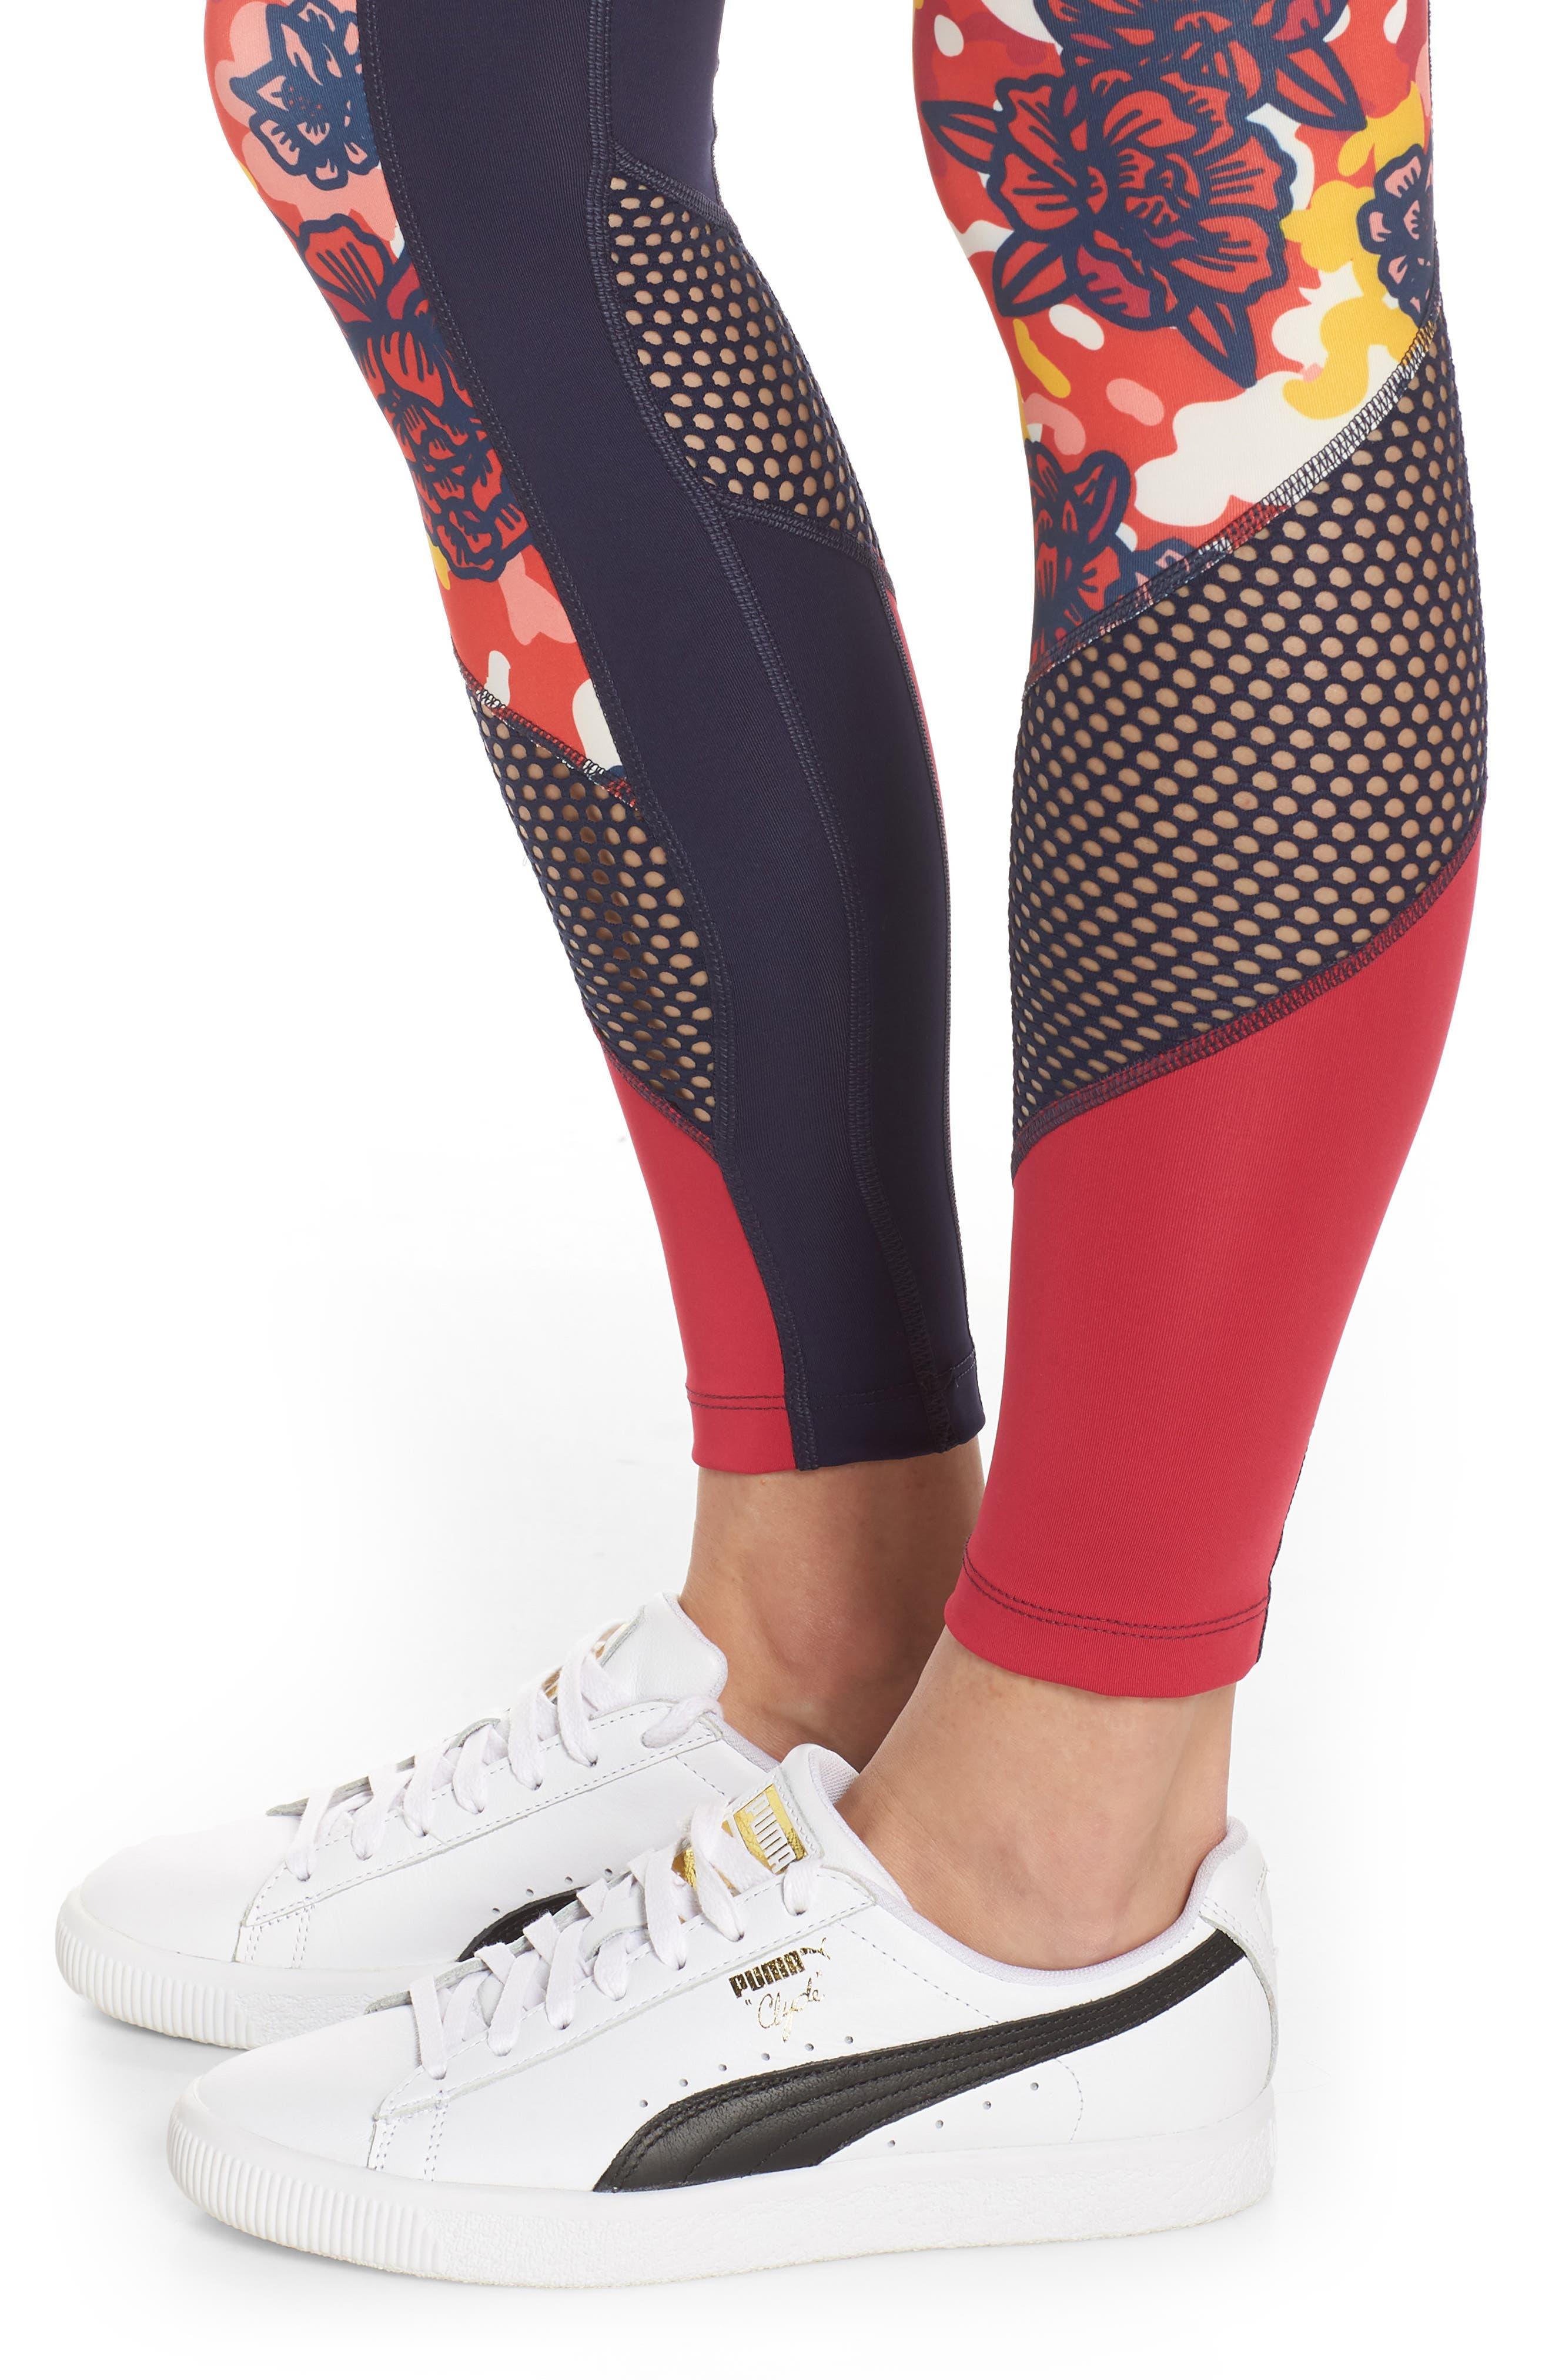 PUMA, Flourish Flourish XTG Leggings, Alternate thumbnail 5, color, PEACOAT-HIBISCUS MULTI